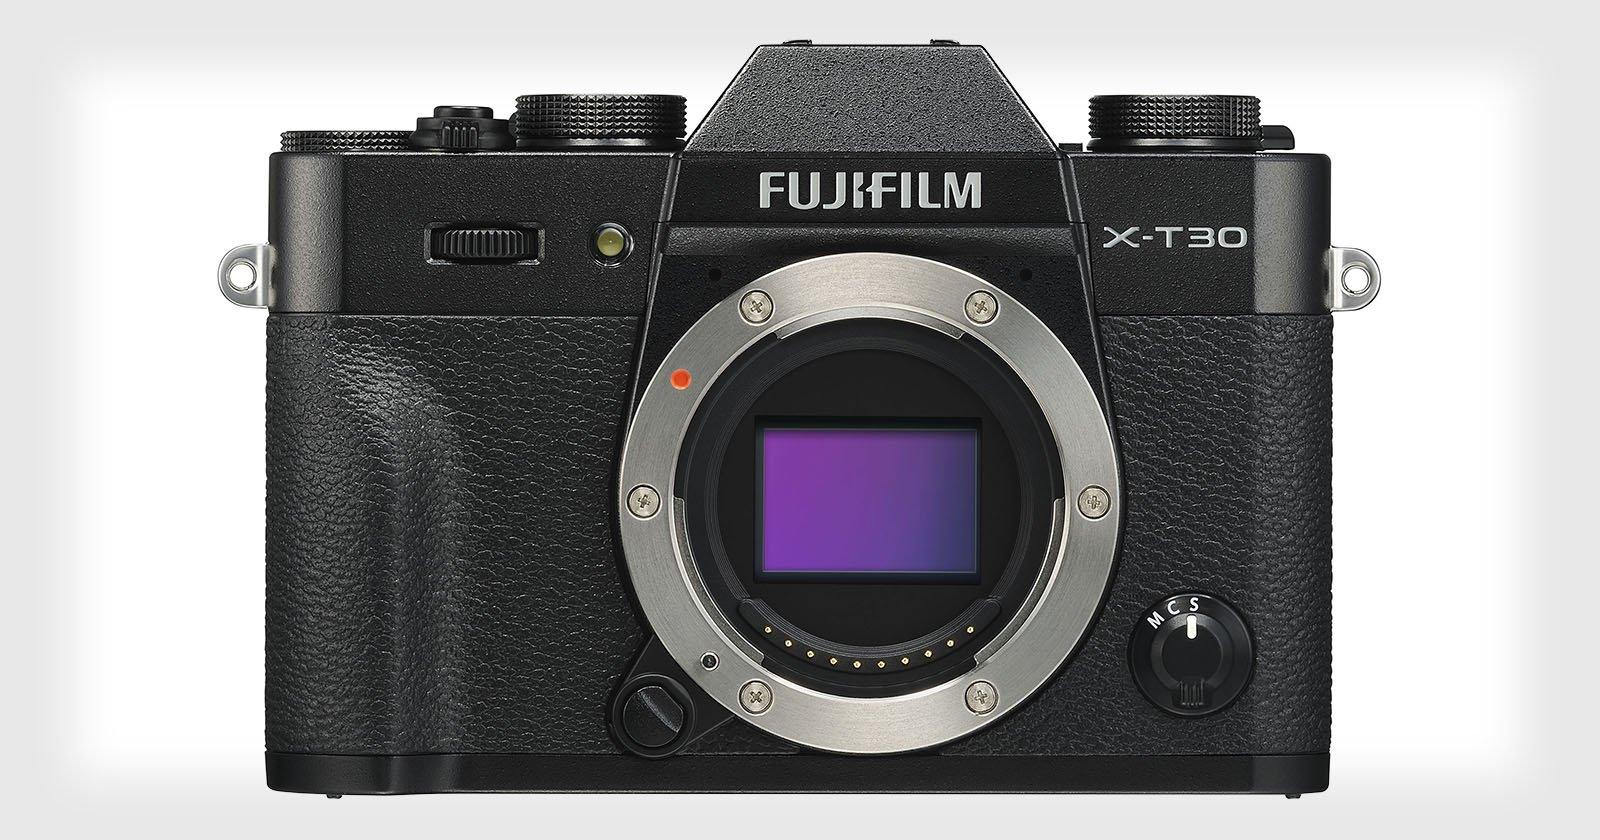 Fujifilm Unveils the X-T30: A Light 4K Camera for $899